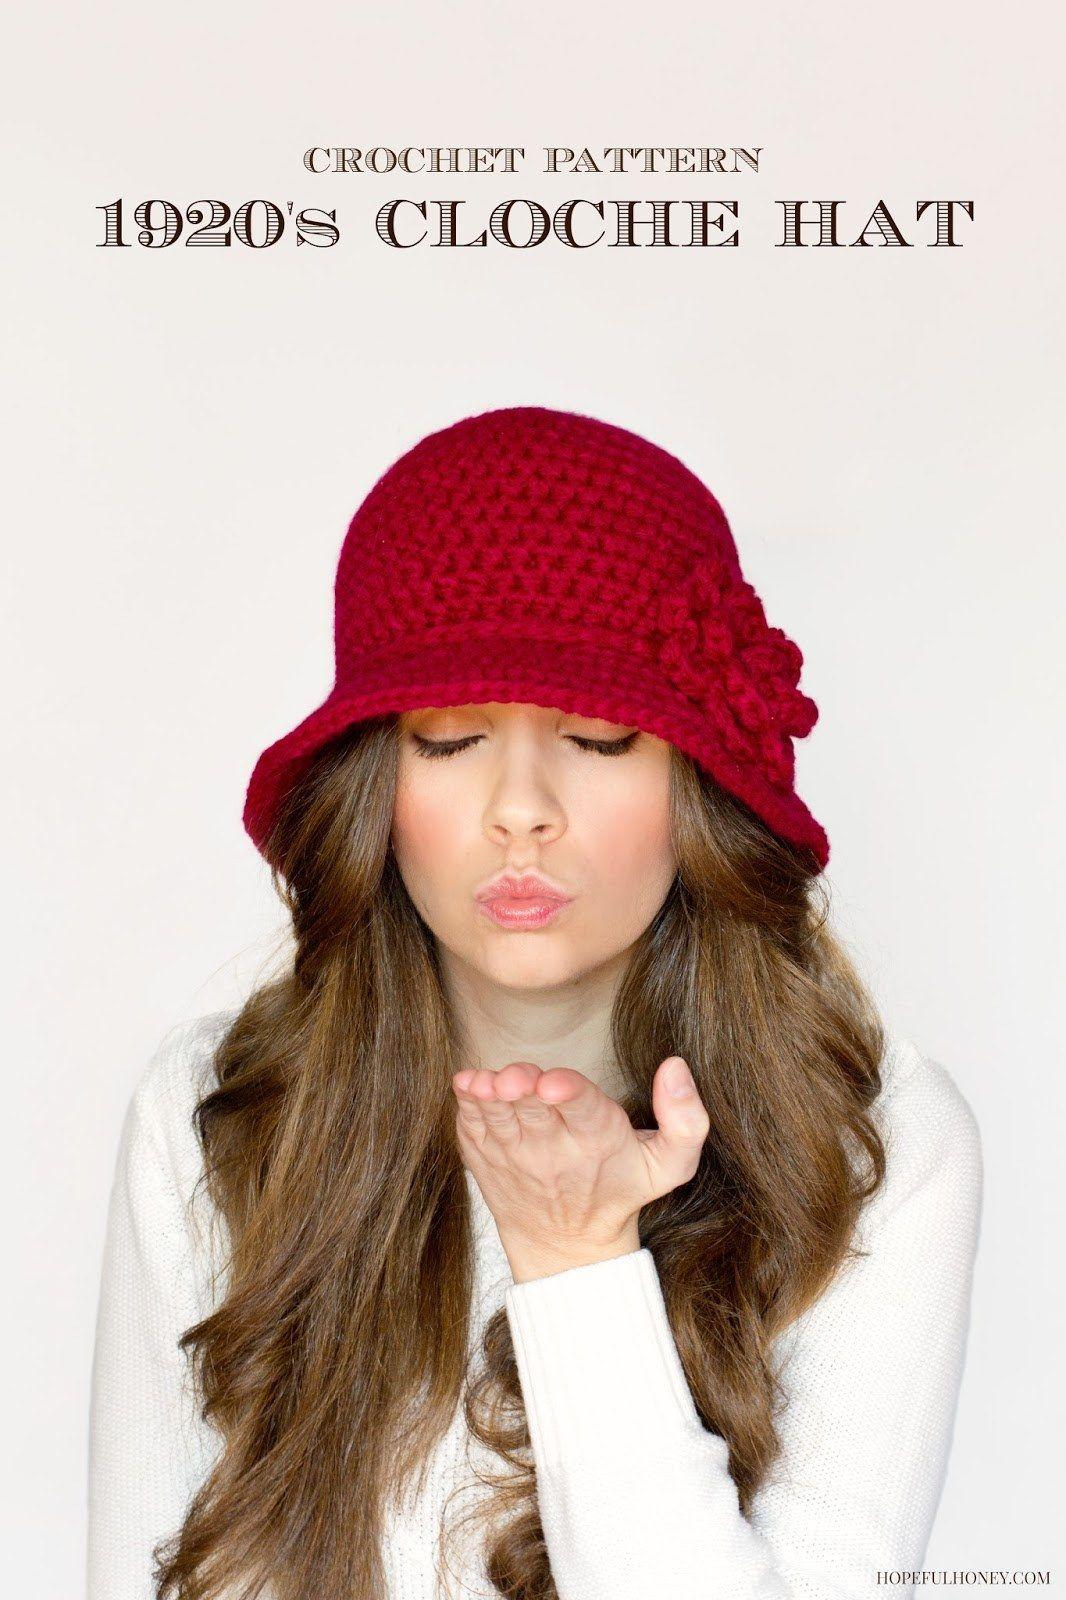 Crochet Cloche Hats The Best Free Collection | Häkelmuster, Häkeln ...